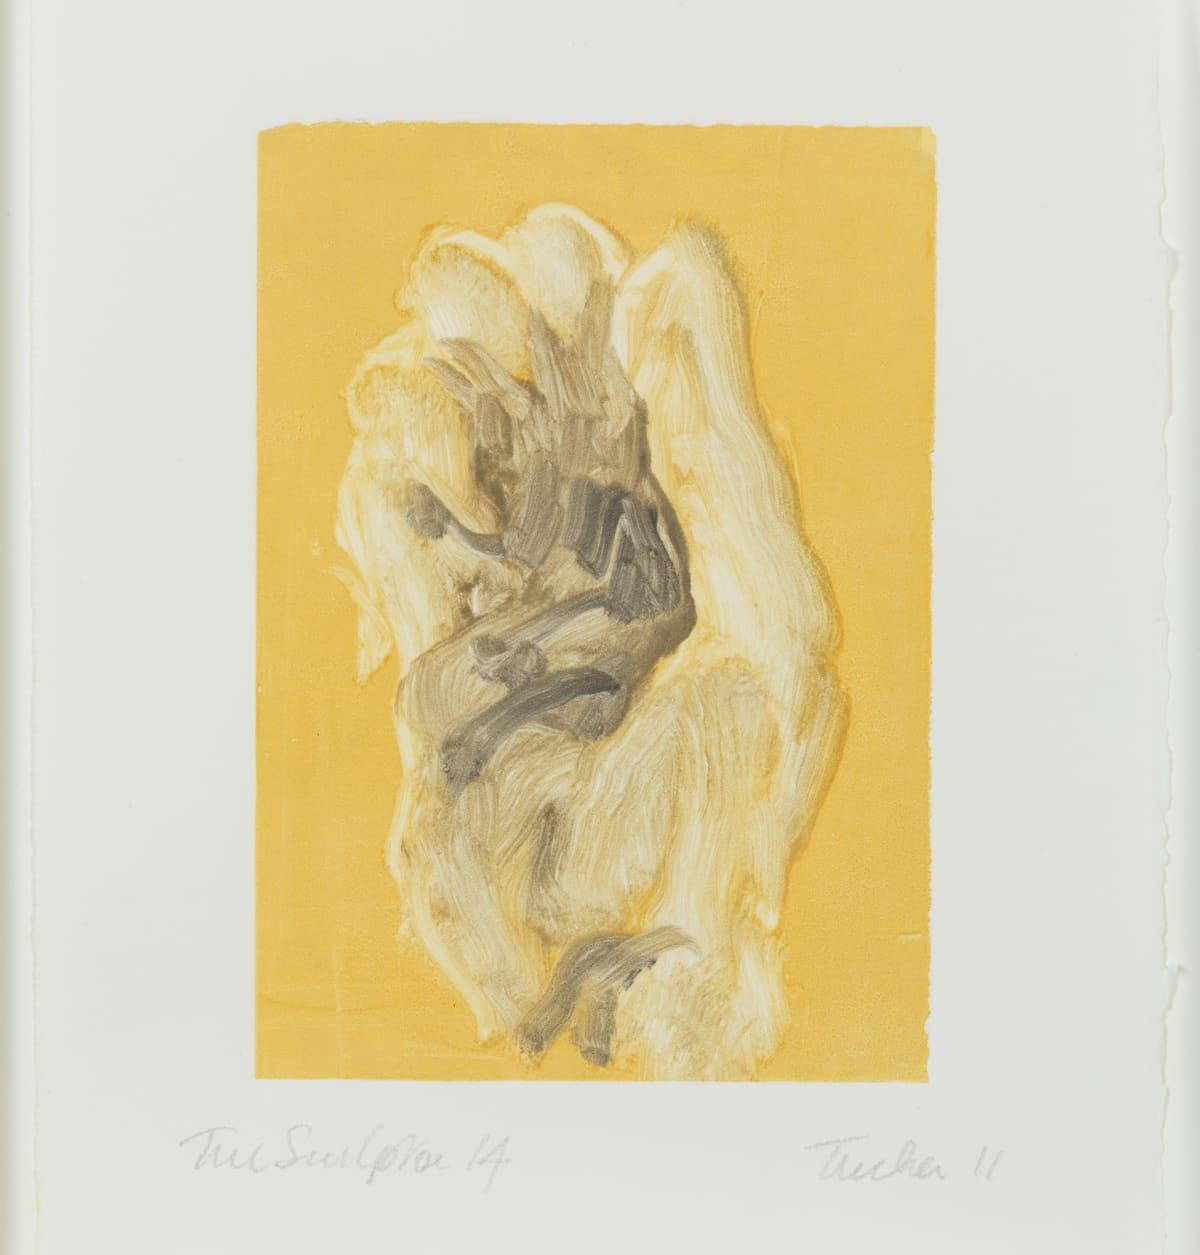 William Tucker, The Sculptor 14, 2011